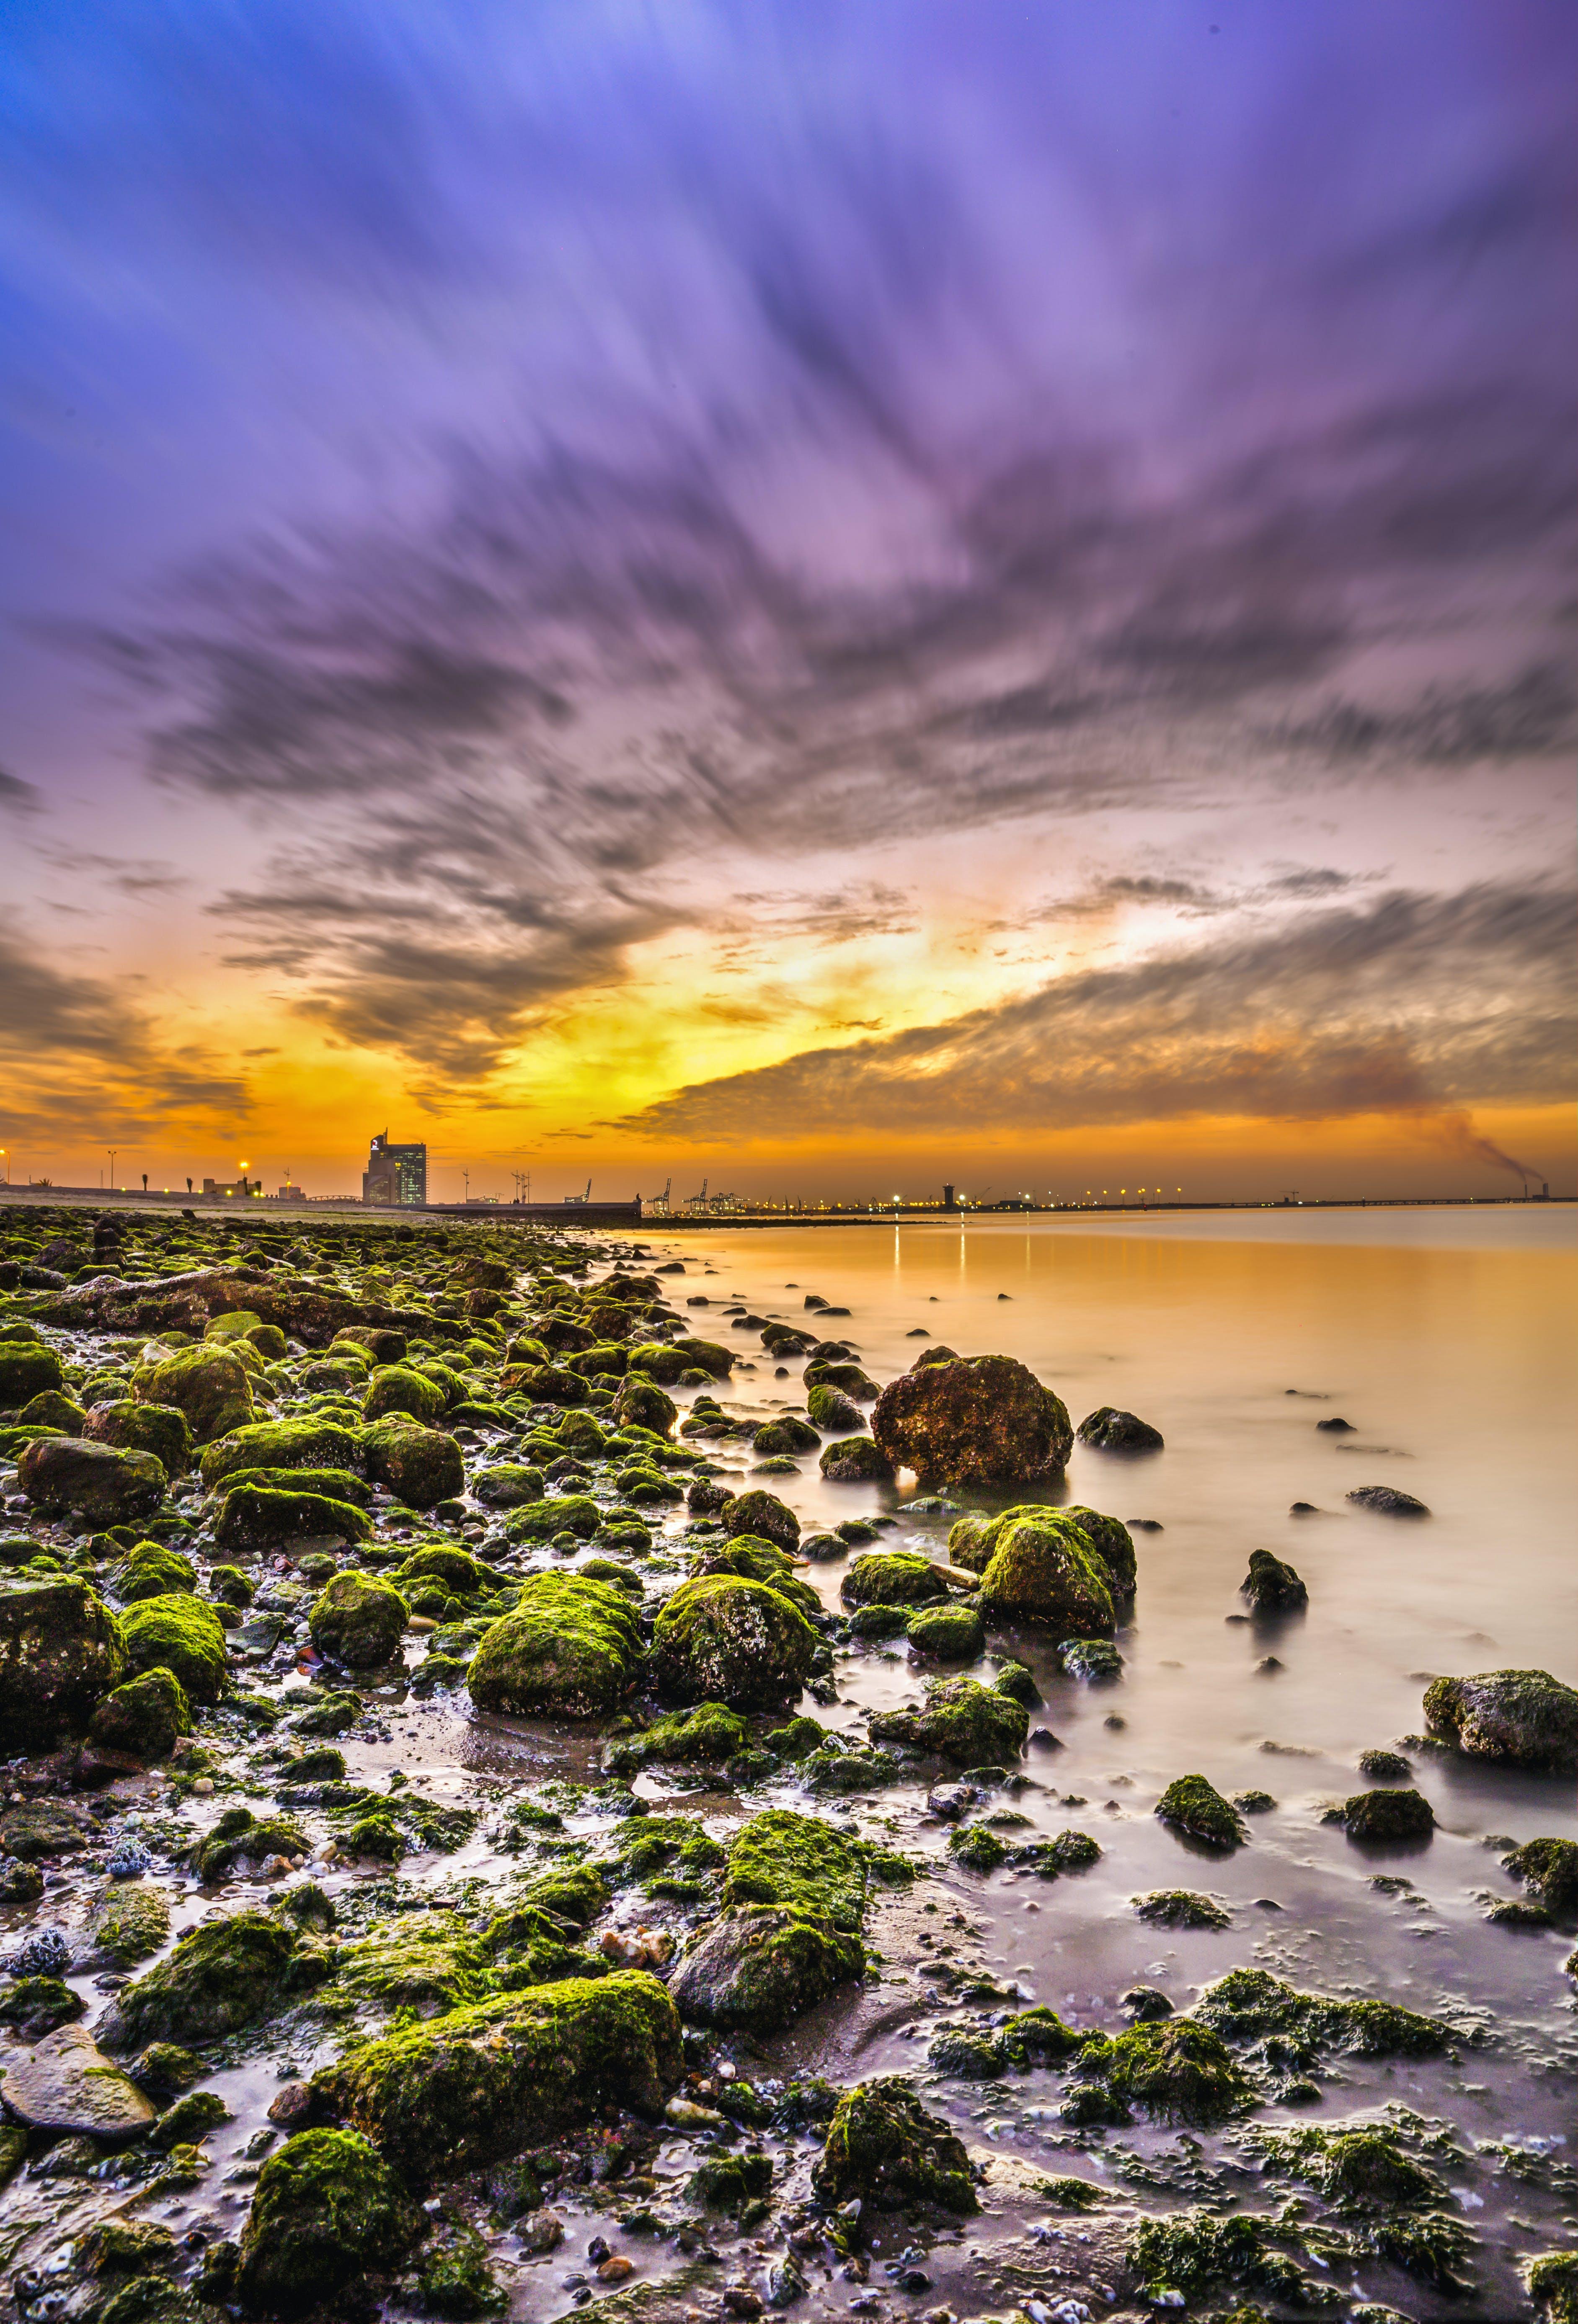 Gratis lagerfoto af kuwait, shuwaikh, shuwaikh port, solnedgang